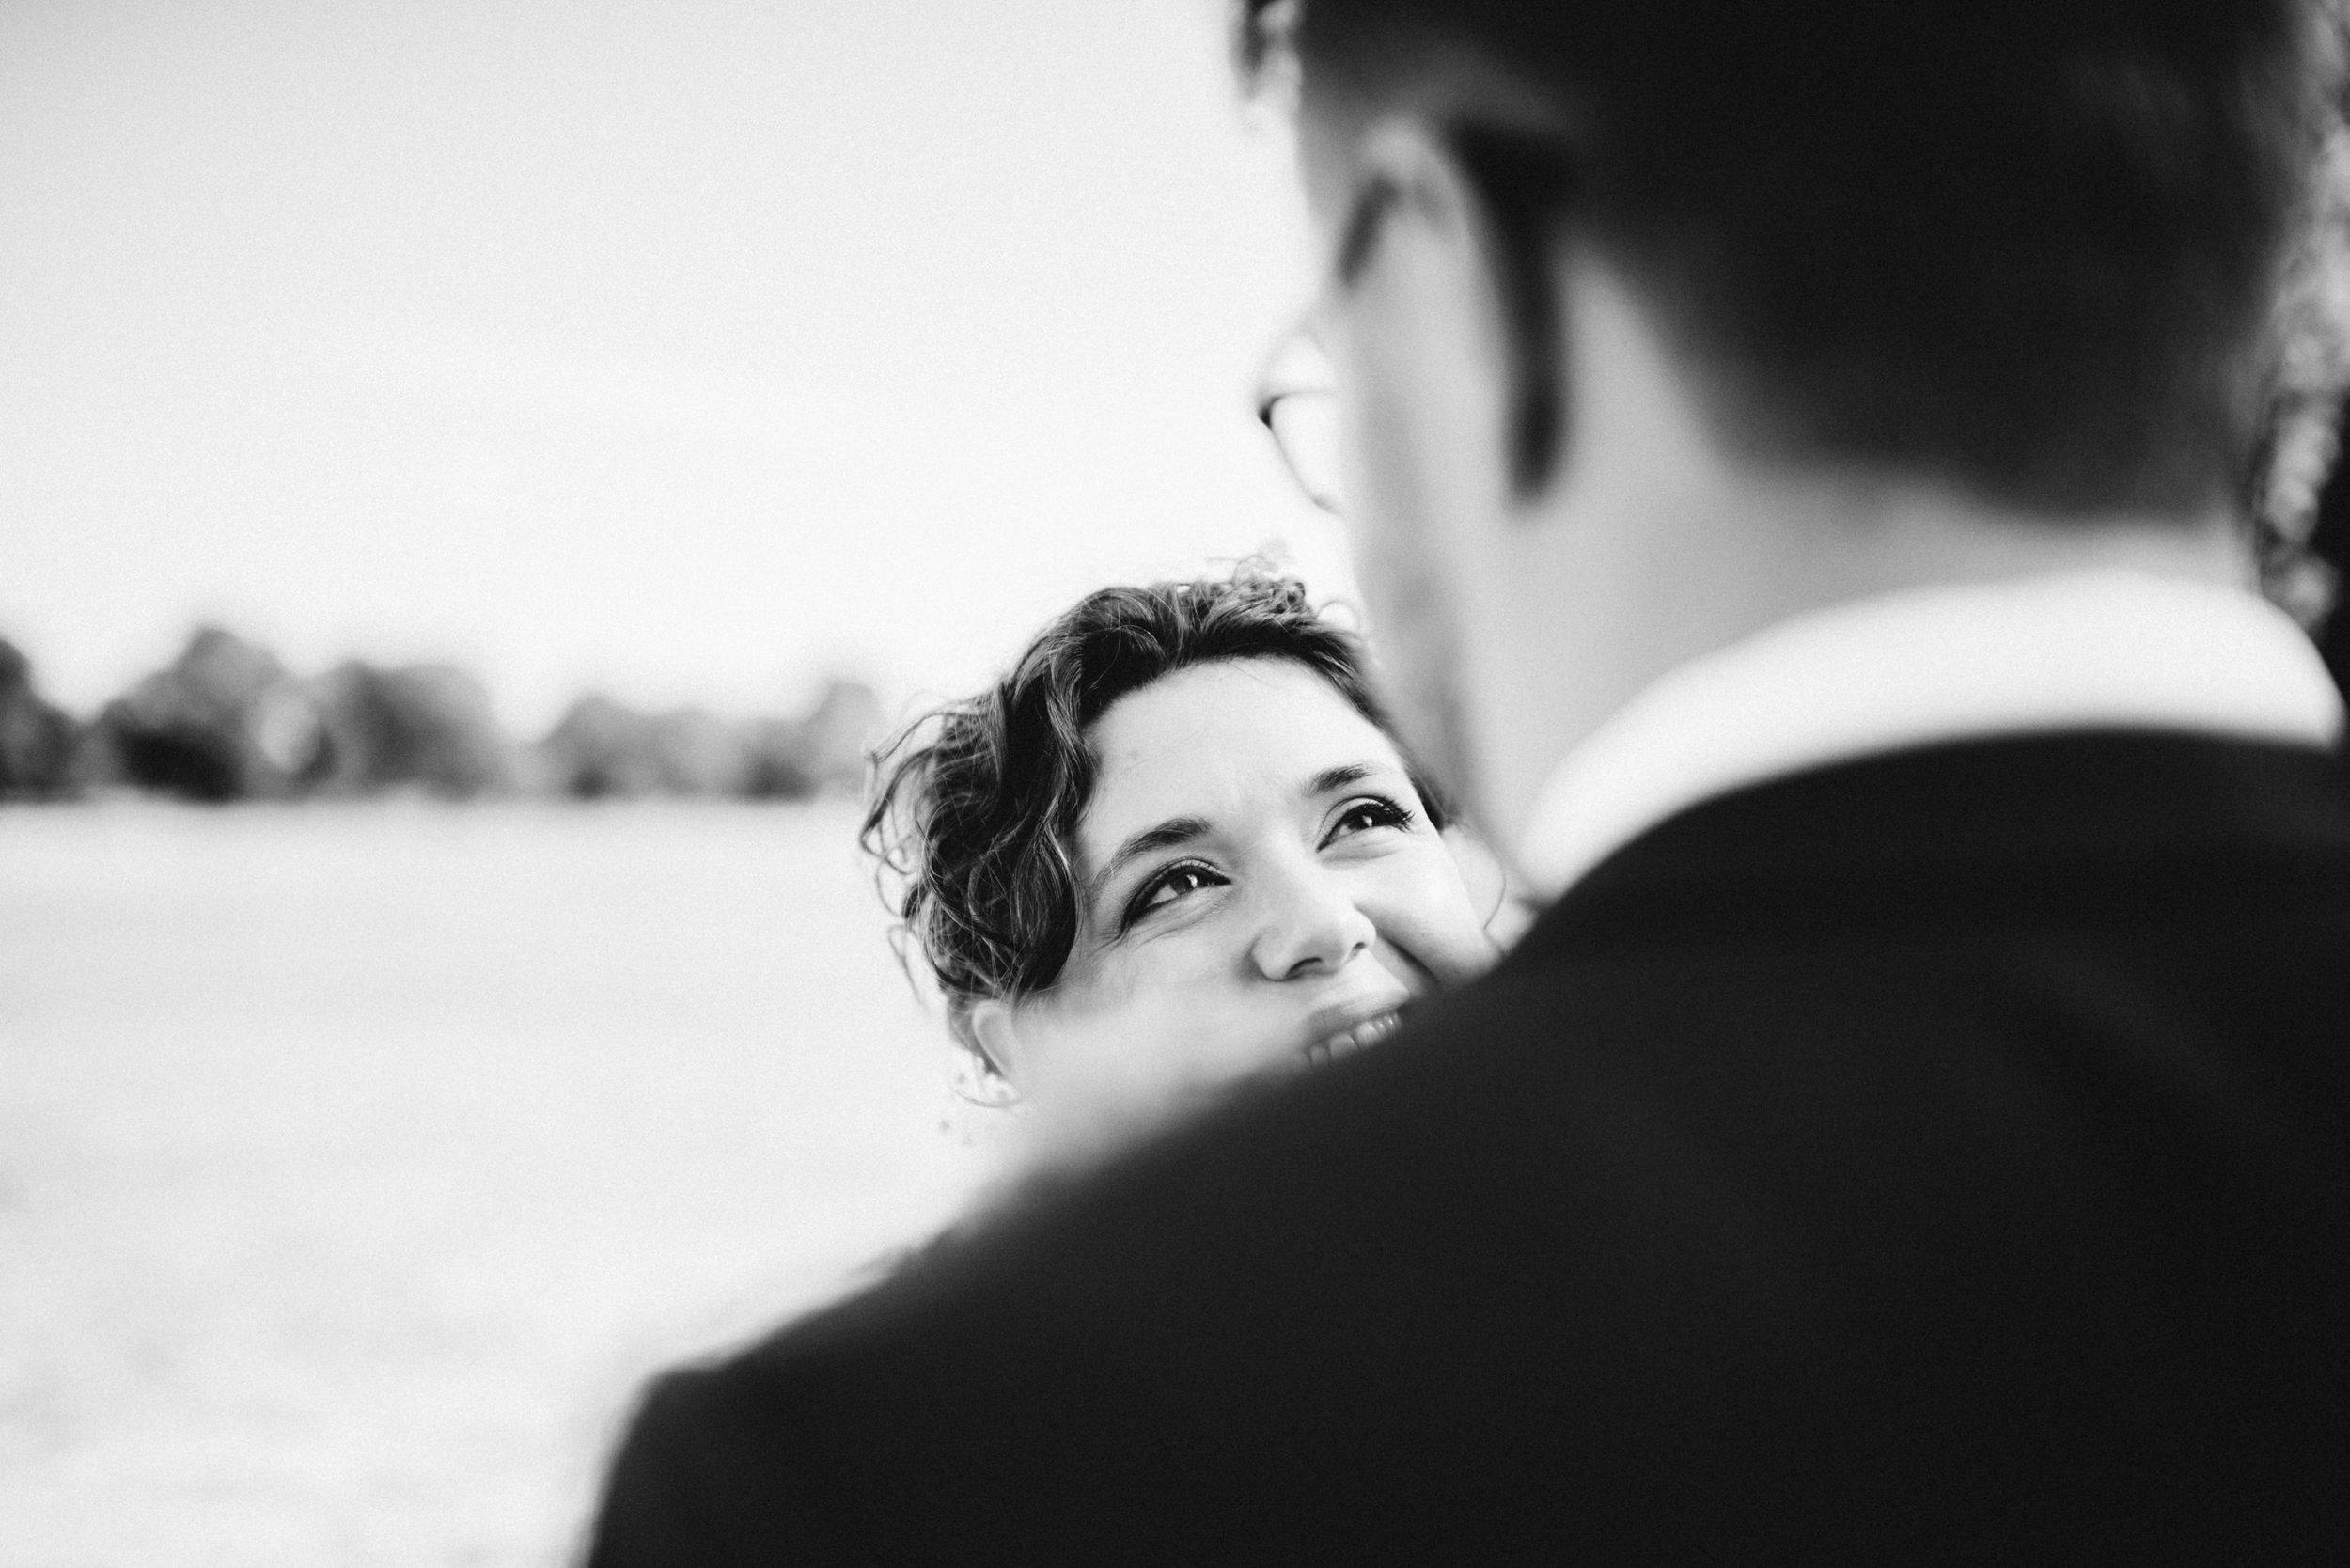 0003-LISA-DEVINE-PHOTOGRAPHY-ALTERNATIVE-WEDDING-PHOTOGRAPHY-SCOTLAND-DESTINATION-WEDDINGS-GLASGOW-WEDDINGS-COOL-WEDDINGS-STYLISH-WEDDINGS.JPG